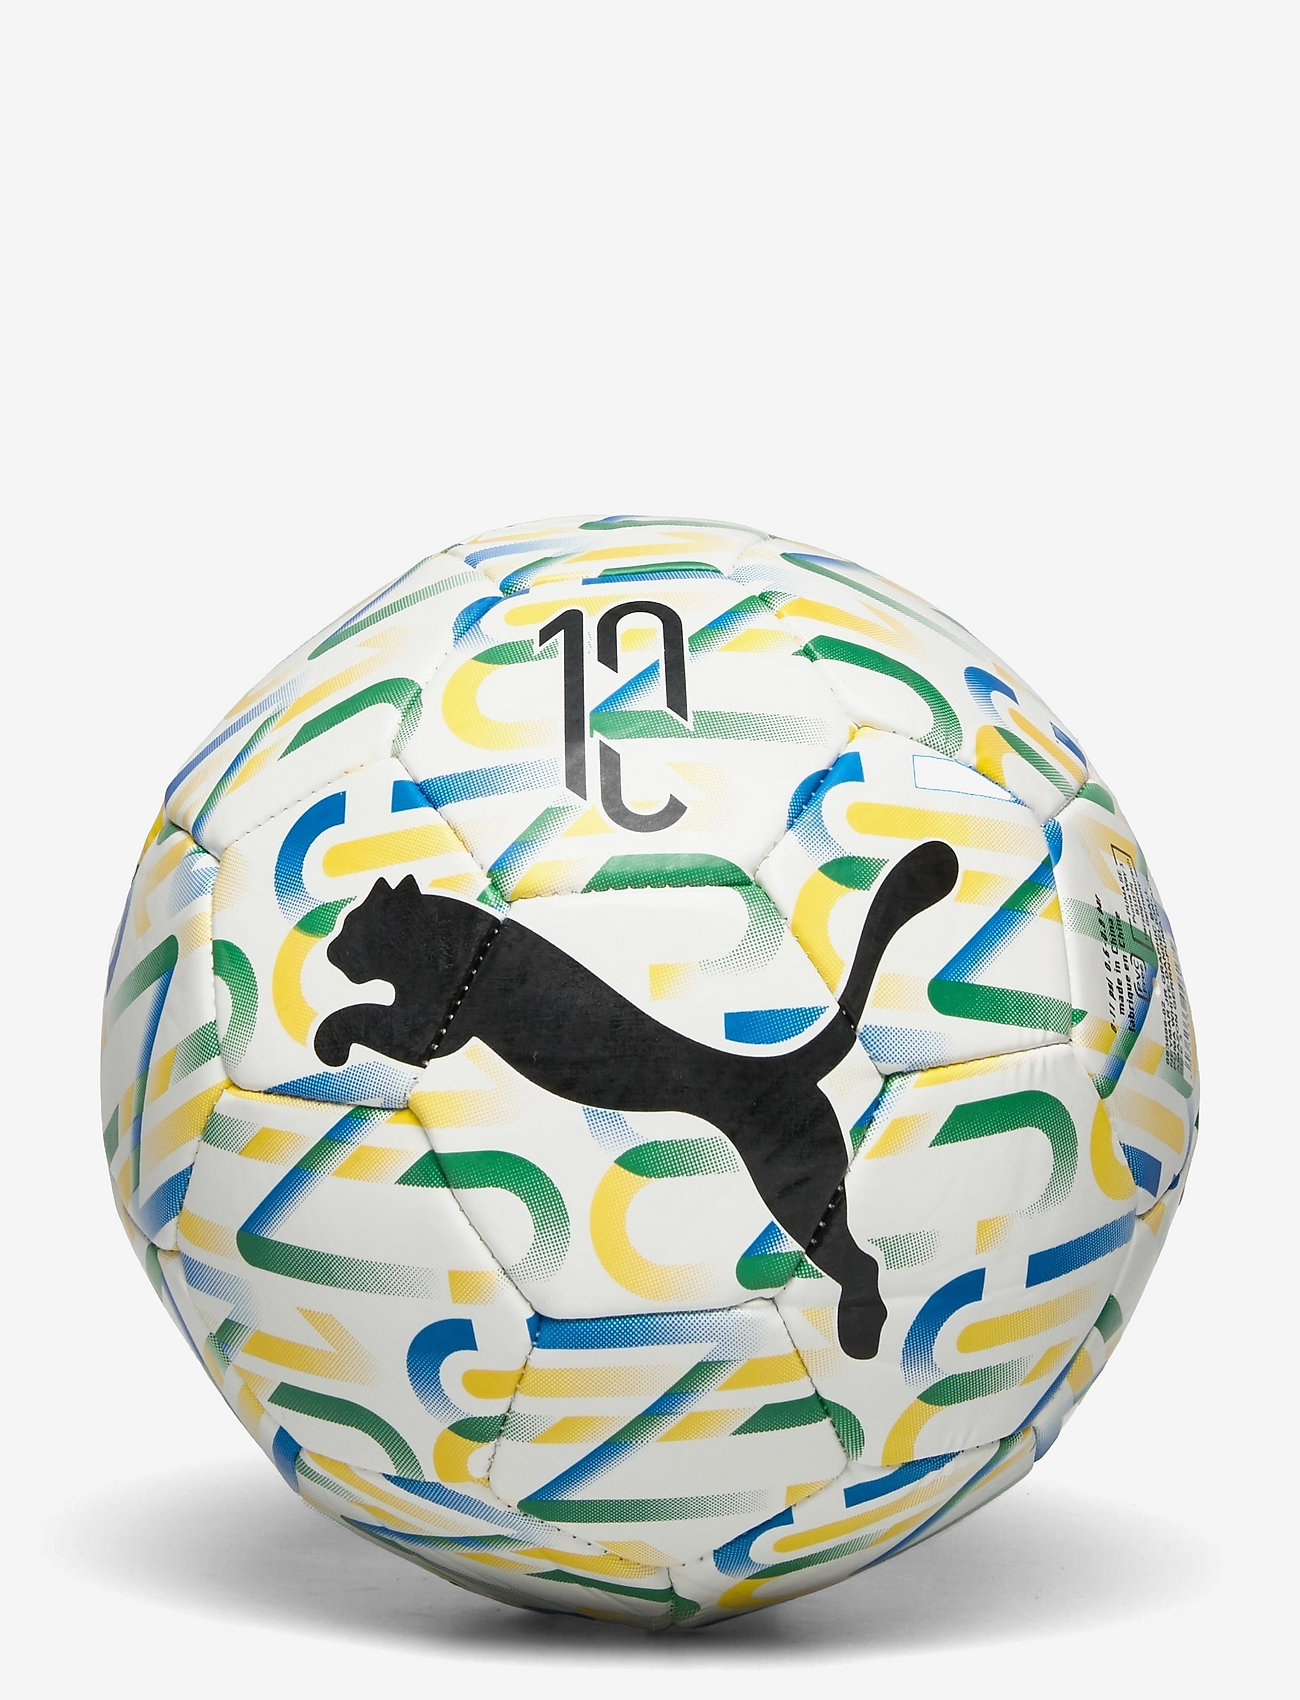 PUMA - Neymar Jr Graphic ball - Équipement de sport - puma white-dandelion-amazon green-puma black - 0